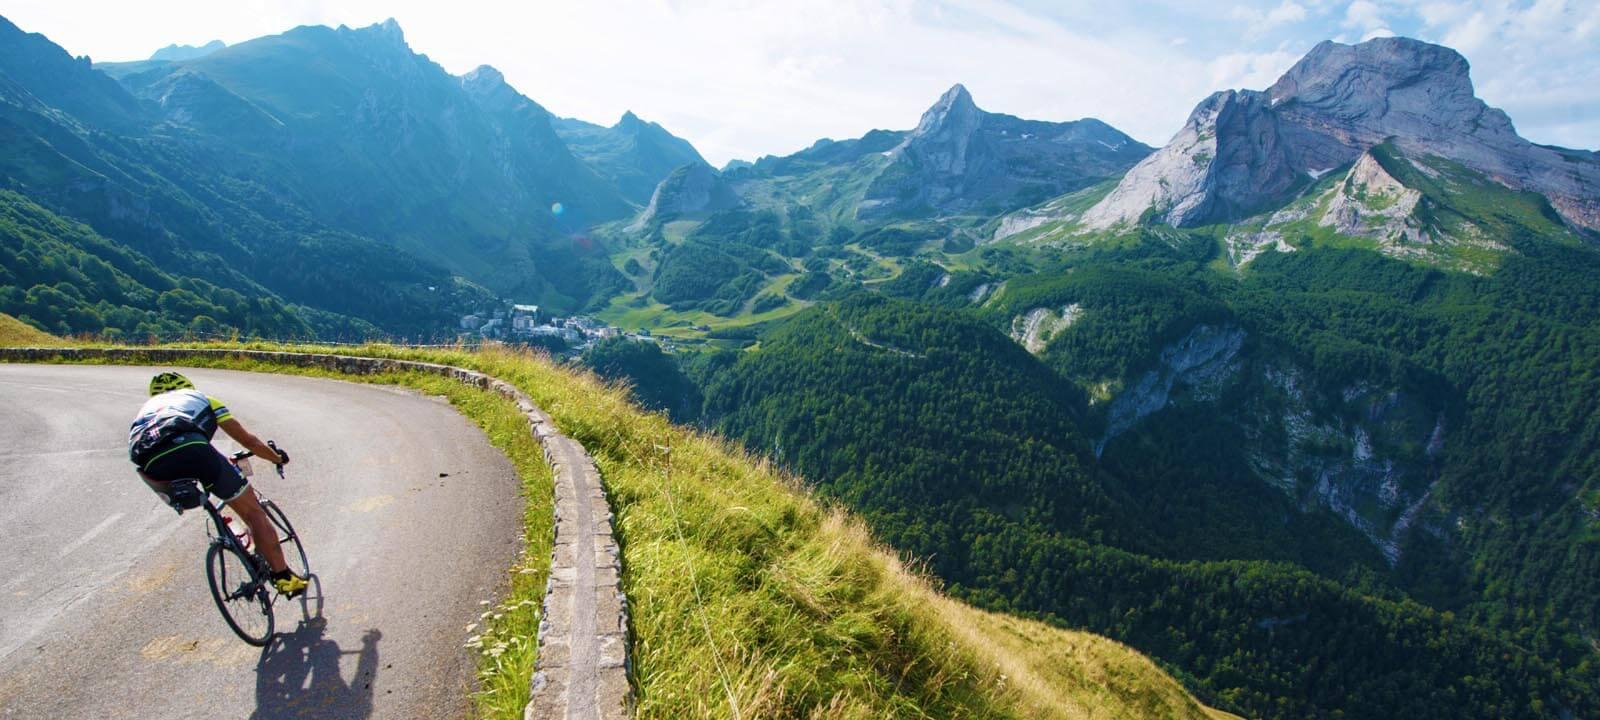 haute-route-alps-title